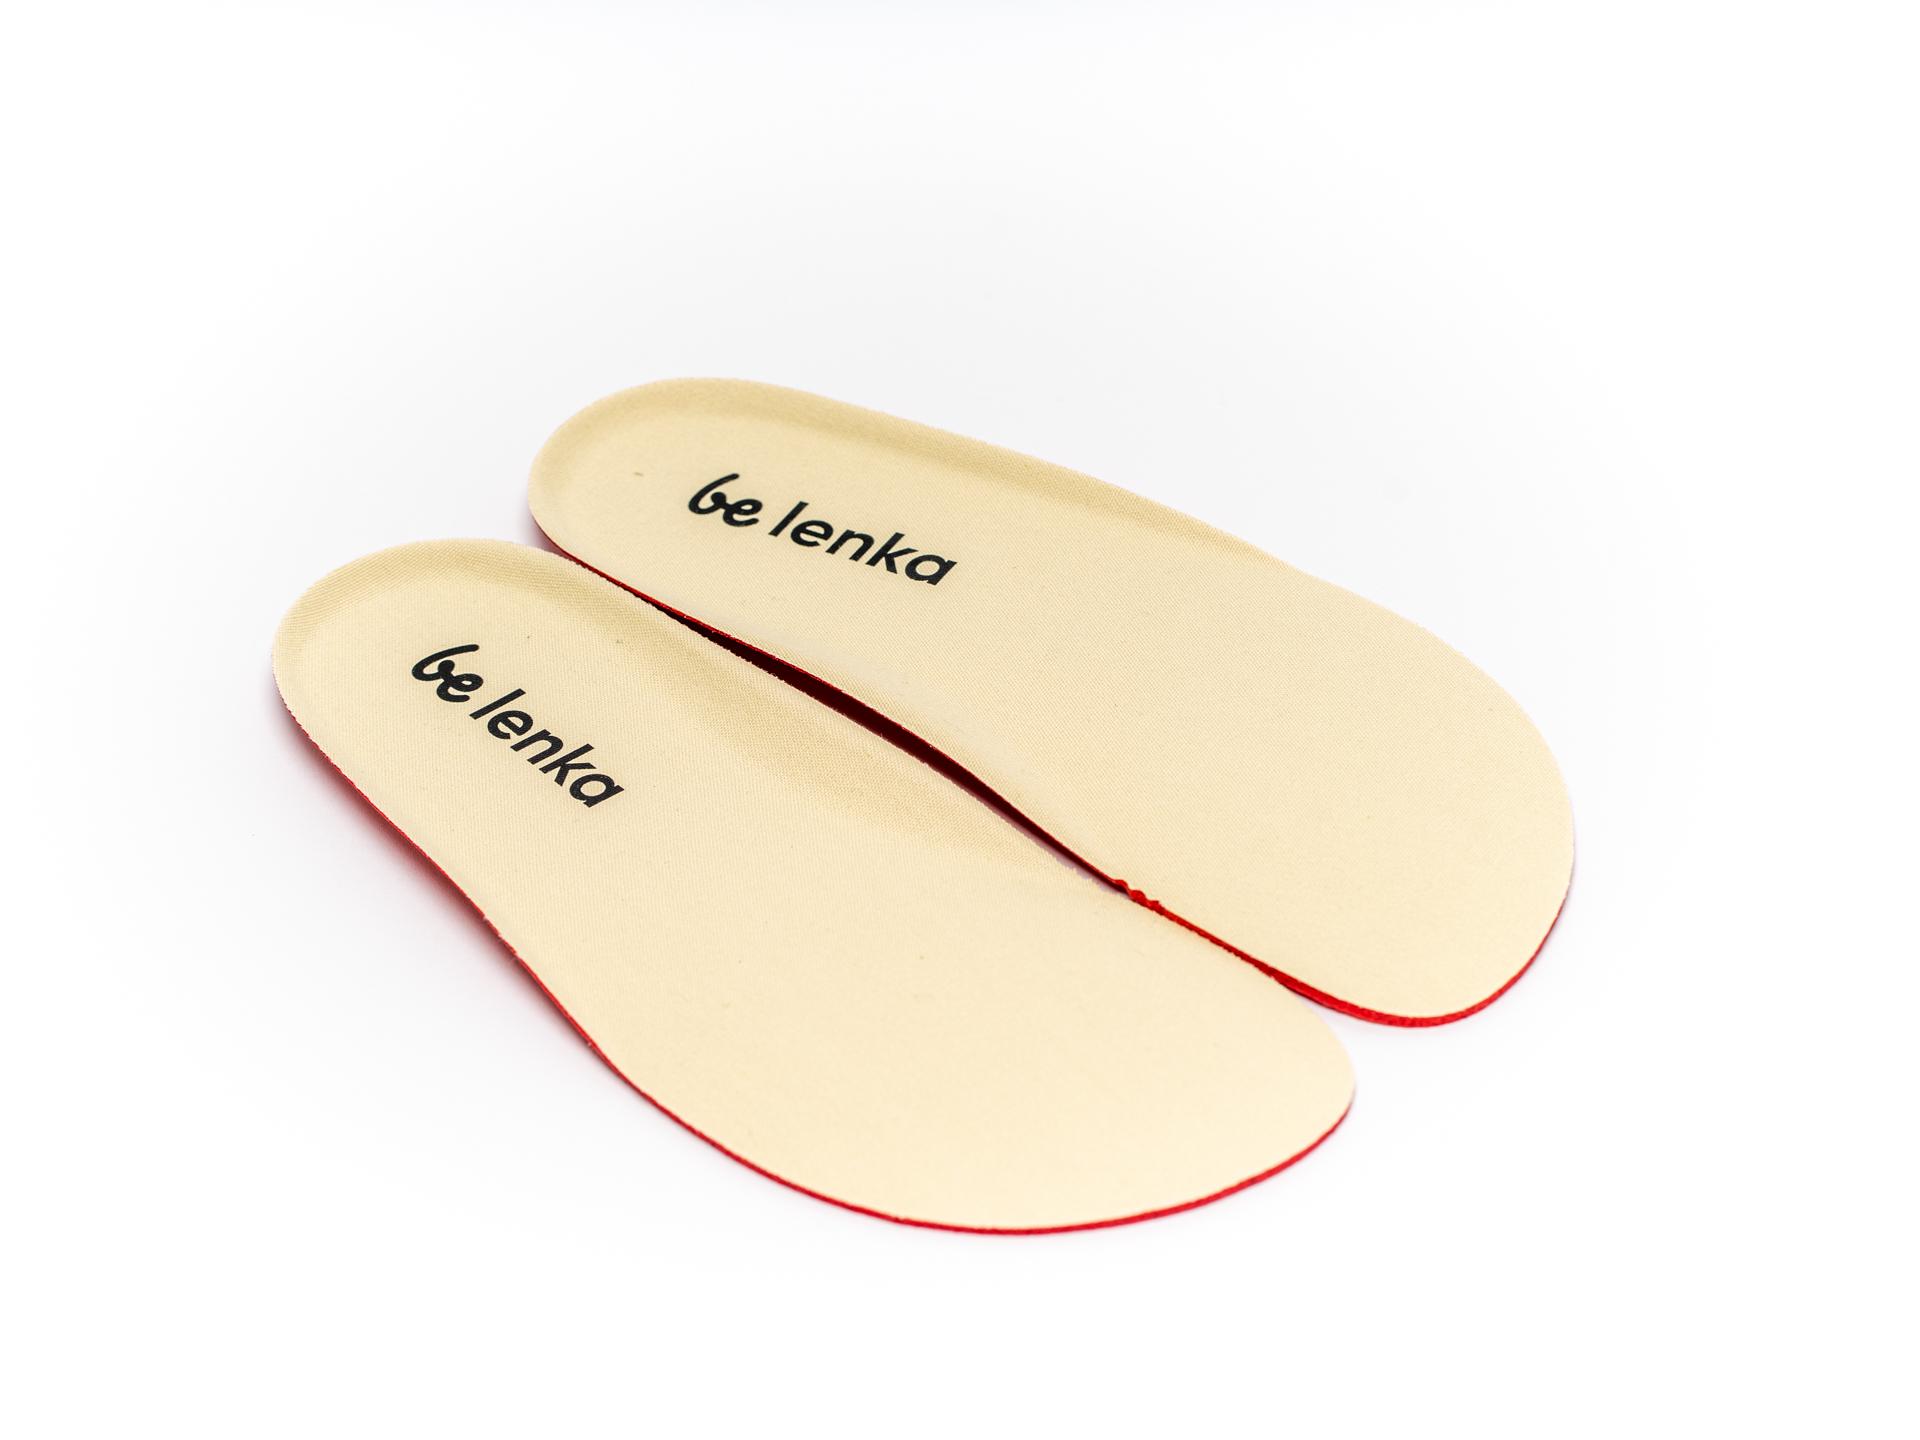 Barefoot Insoles Be Lenka - Ortho - Comfort 41